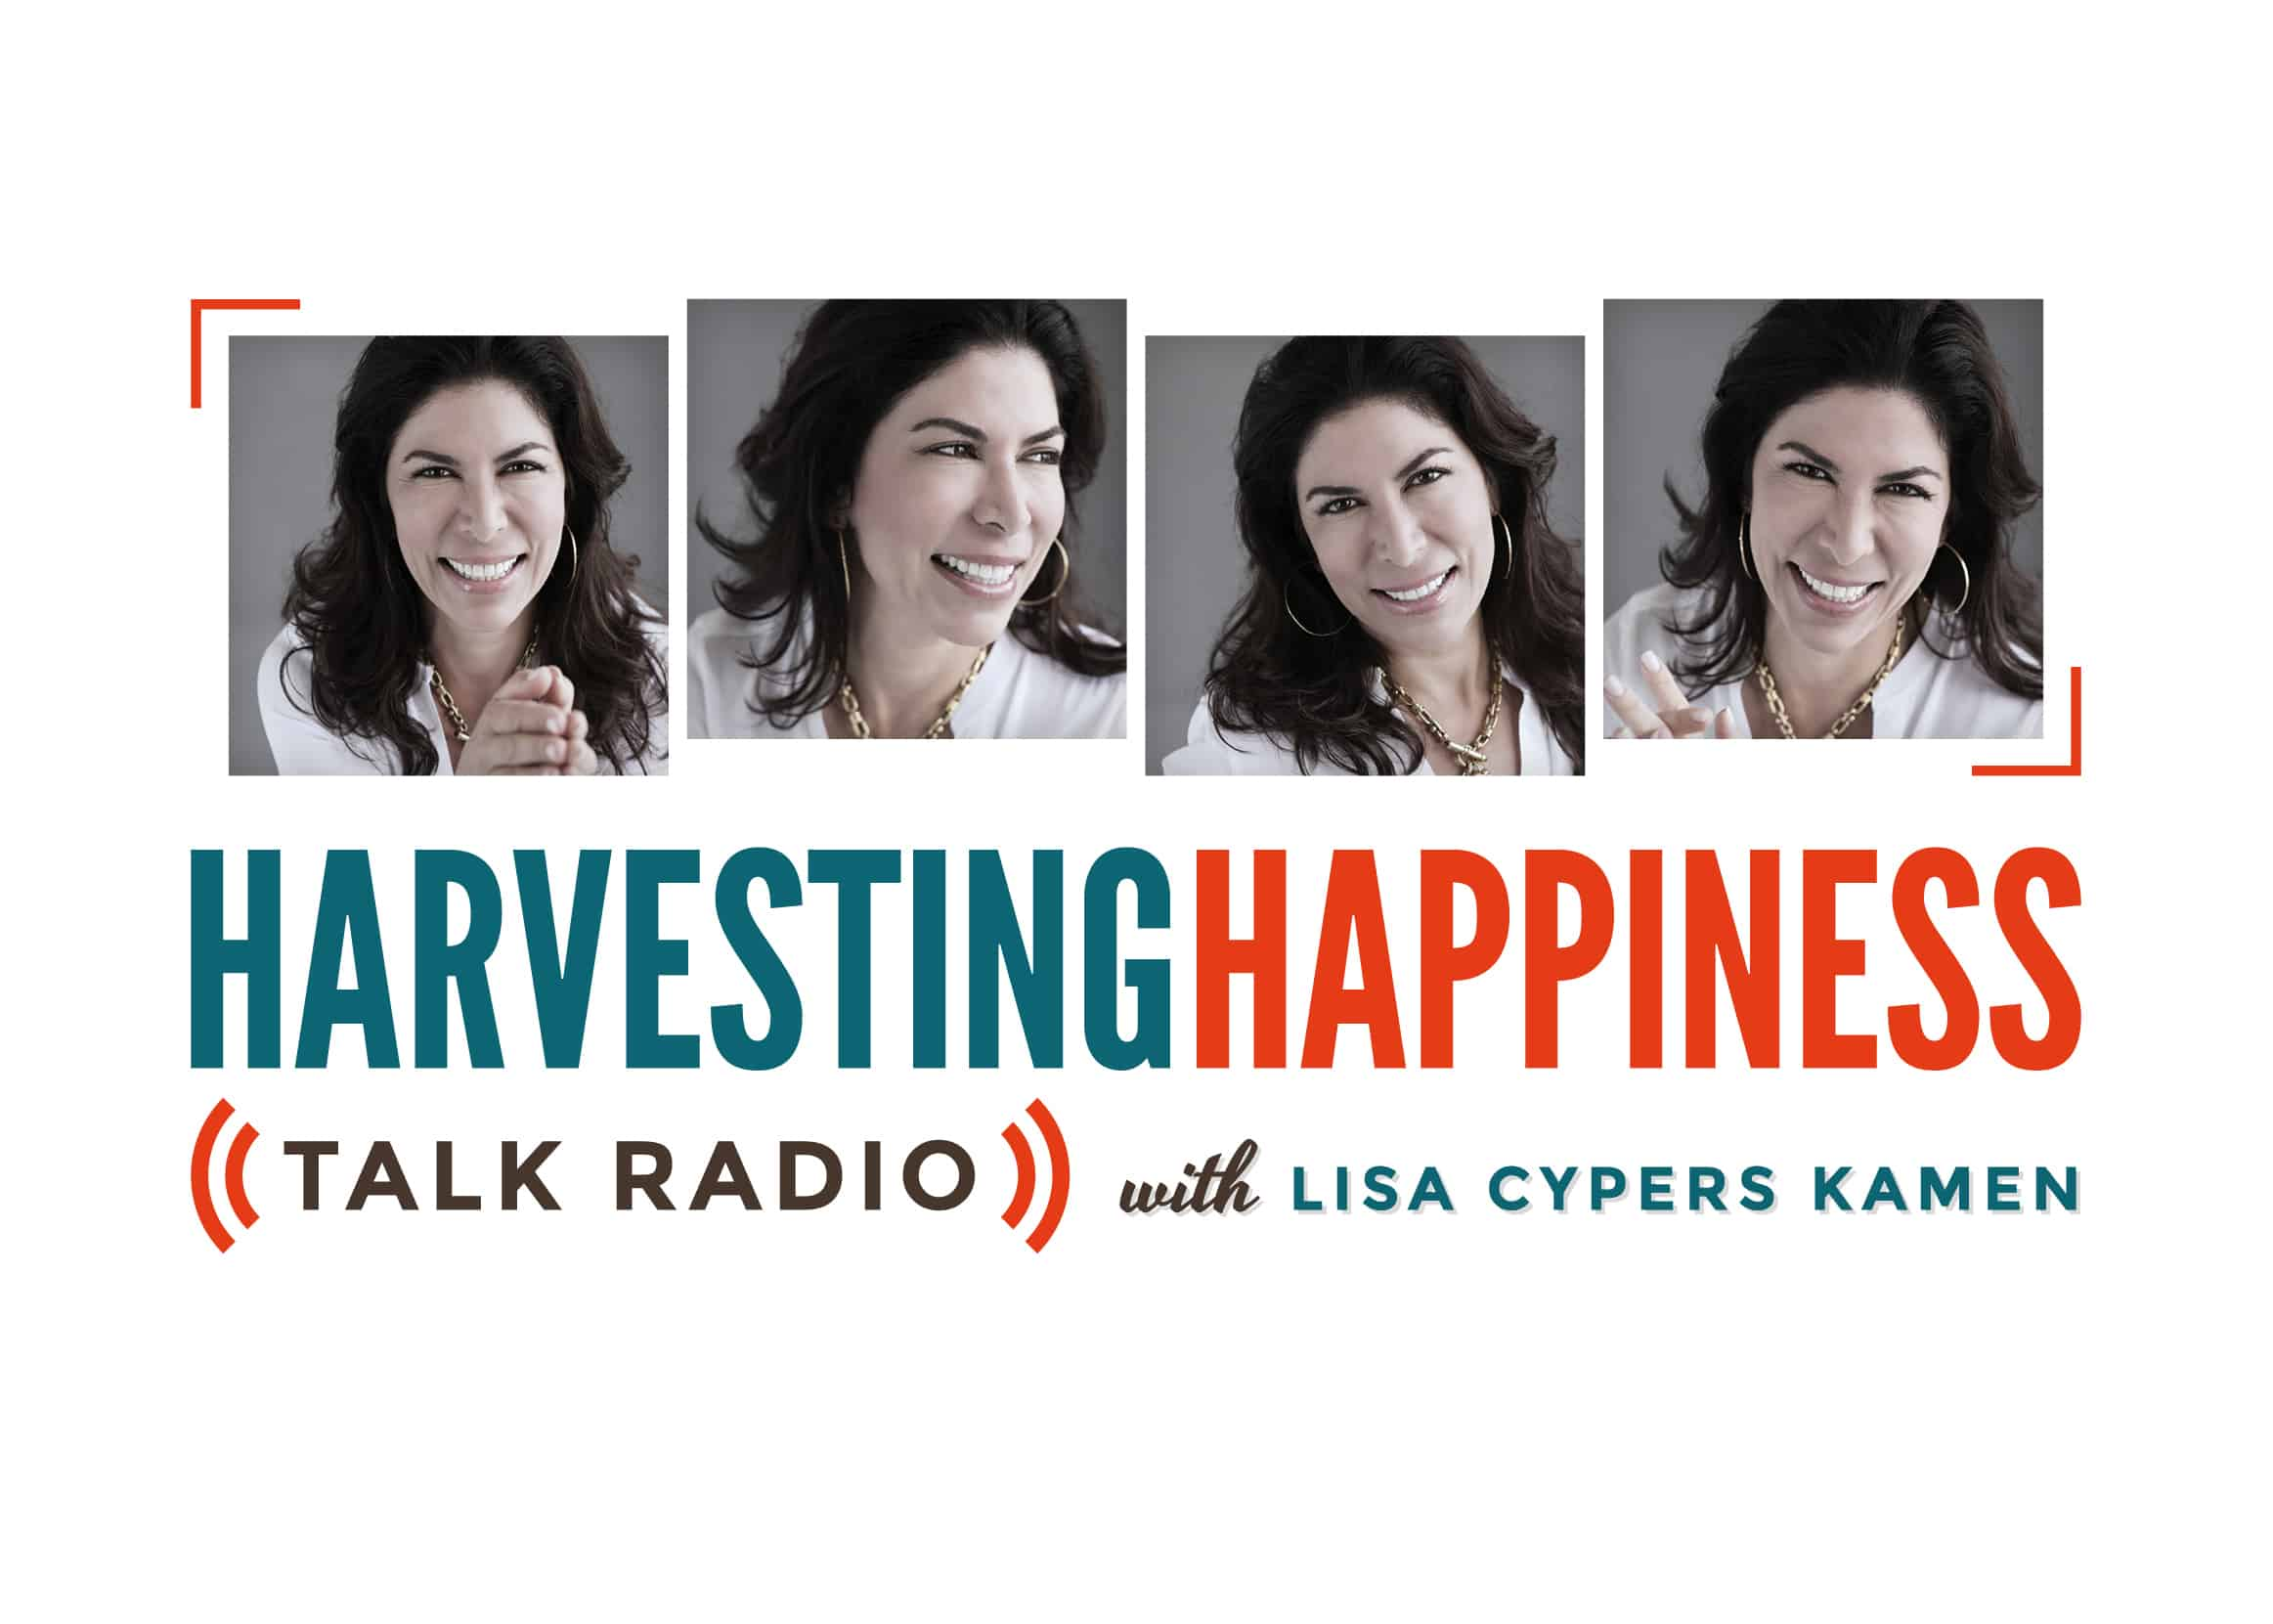 Harvesting Happiness Talk Radio